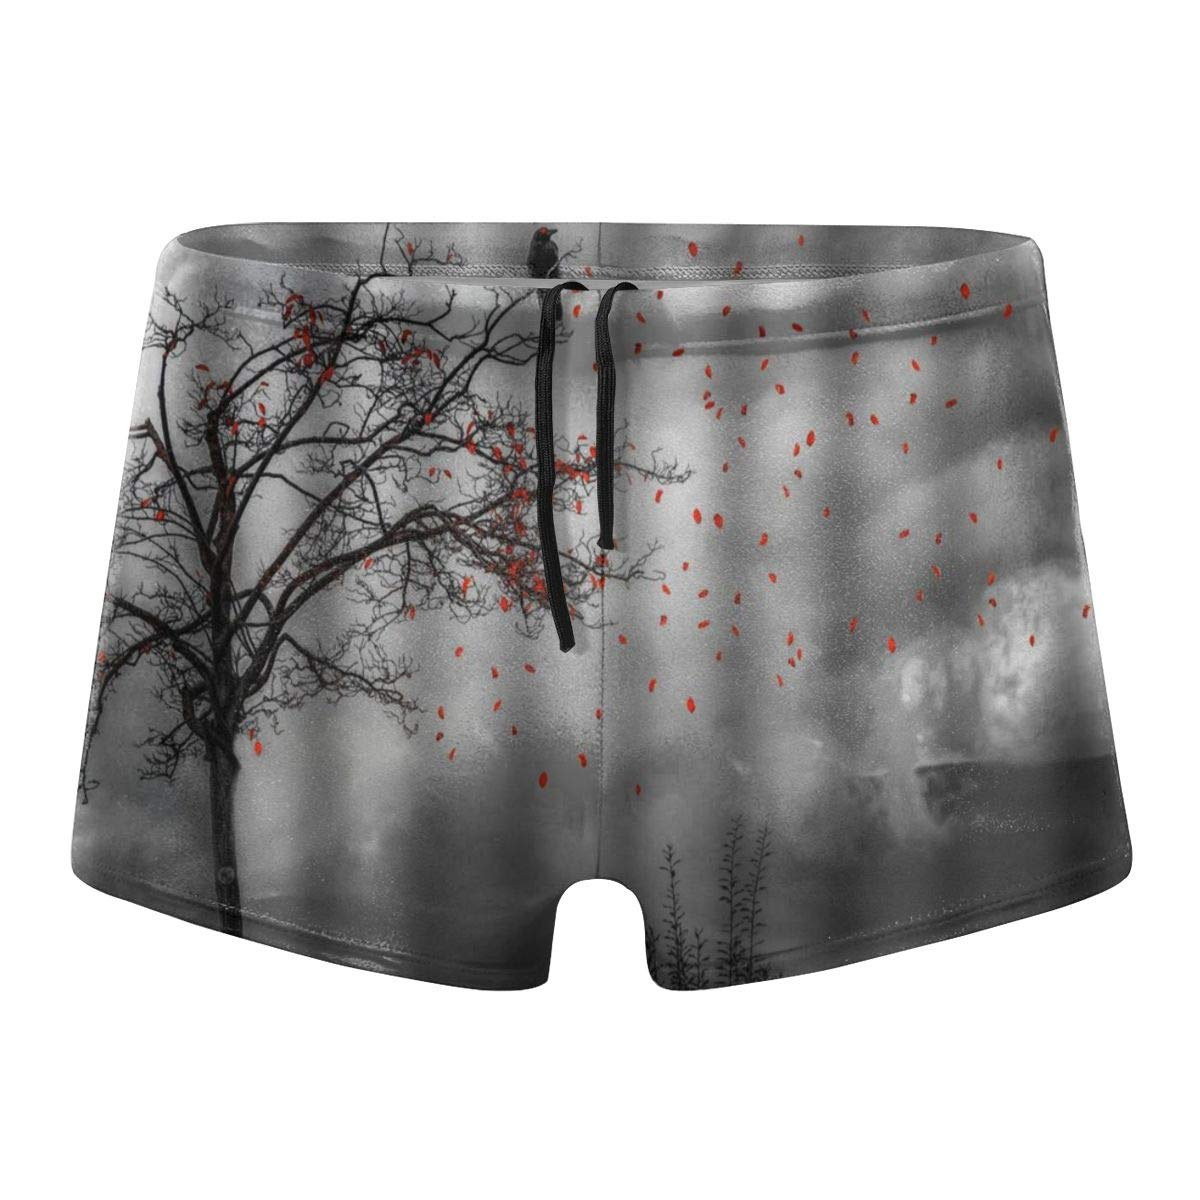 349tg1u Tree and Bird Fantasy Black White Mens Swim Trunks Shorts Athletic Swimwear Briefs Boardshorts